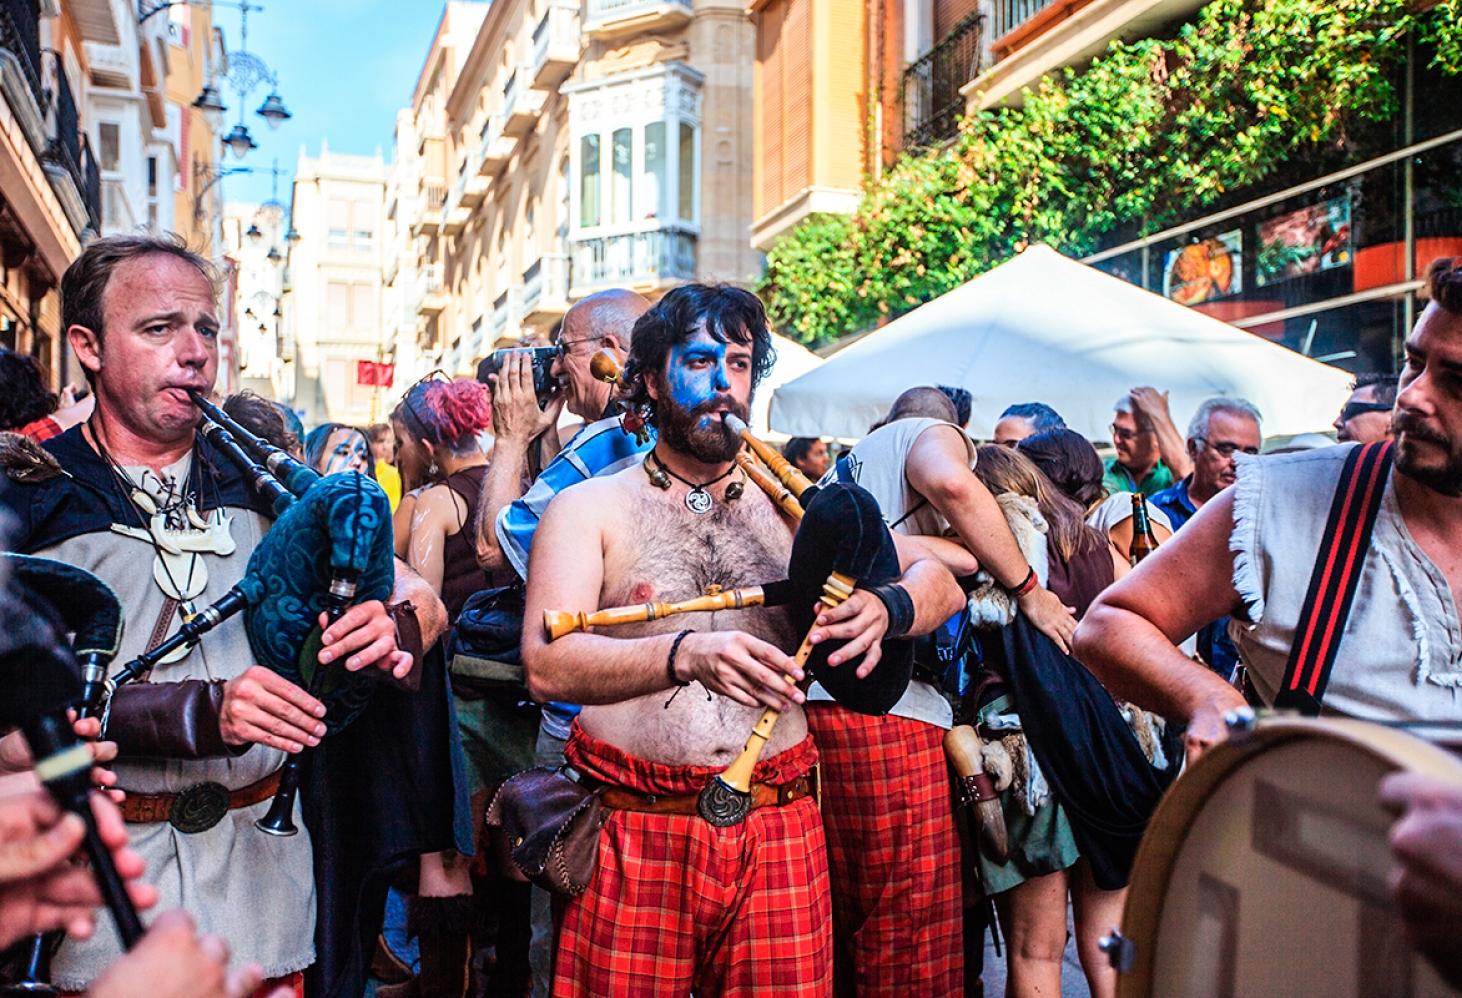 Фестиваль Карфагенян и Римлян, Картахена, Испания 15.09.2017–24.09. 2017